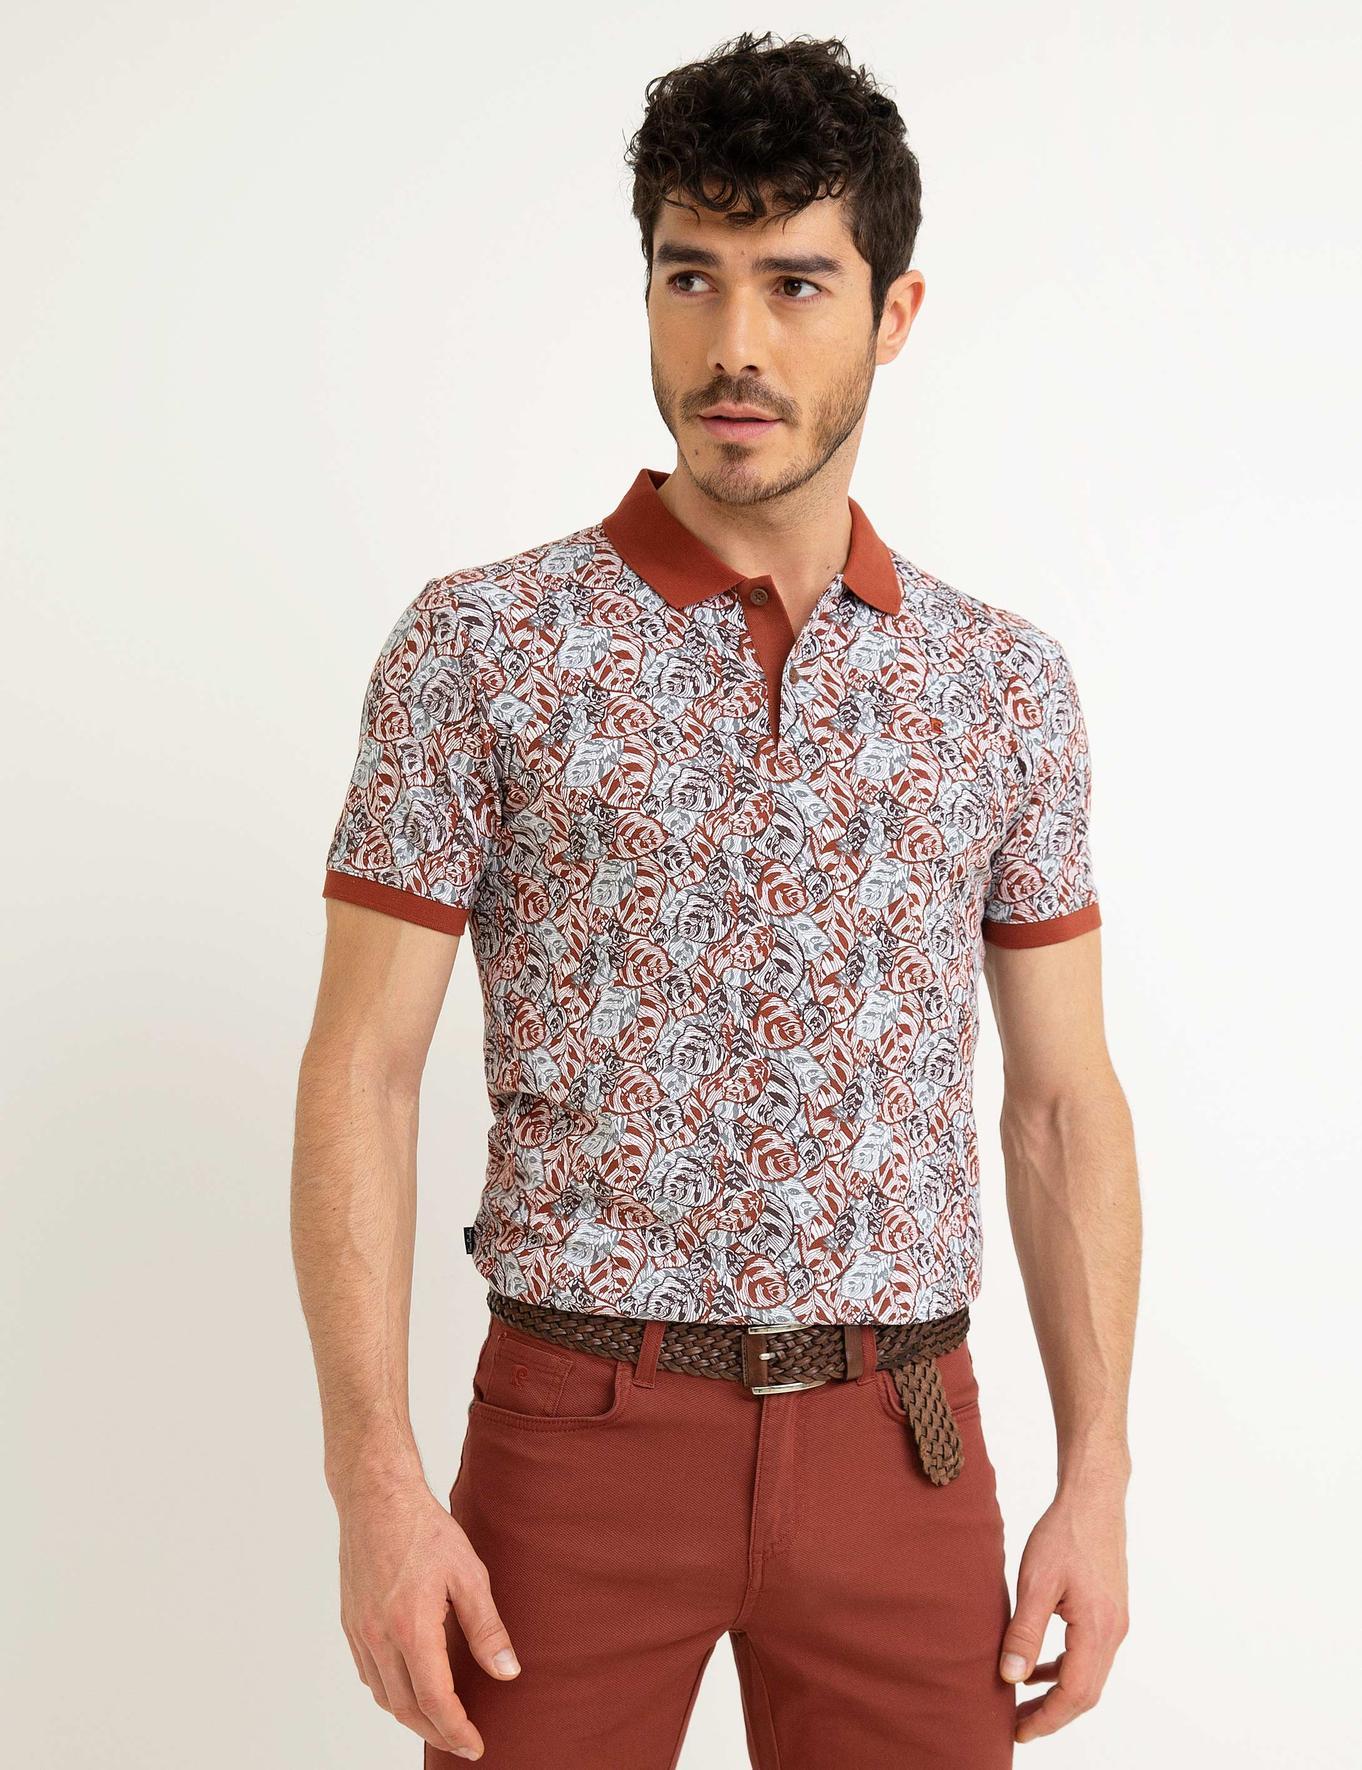 Taba Slim Fit T-Shirt